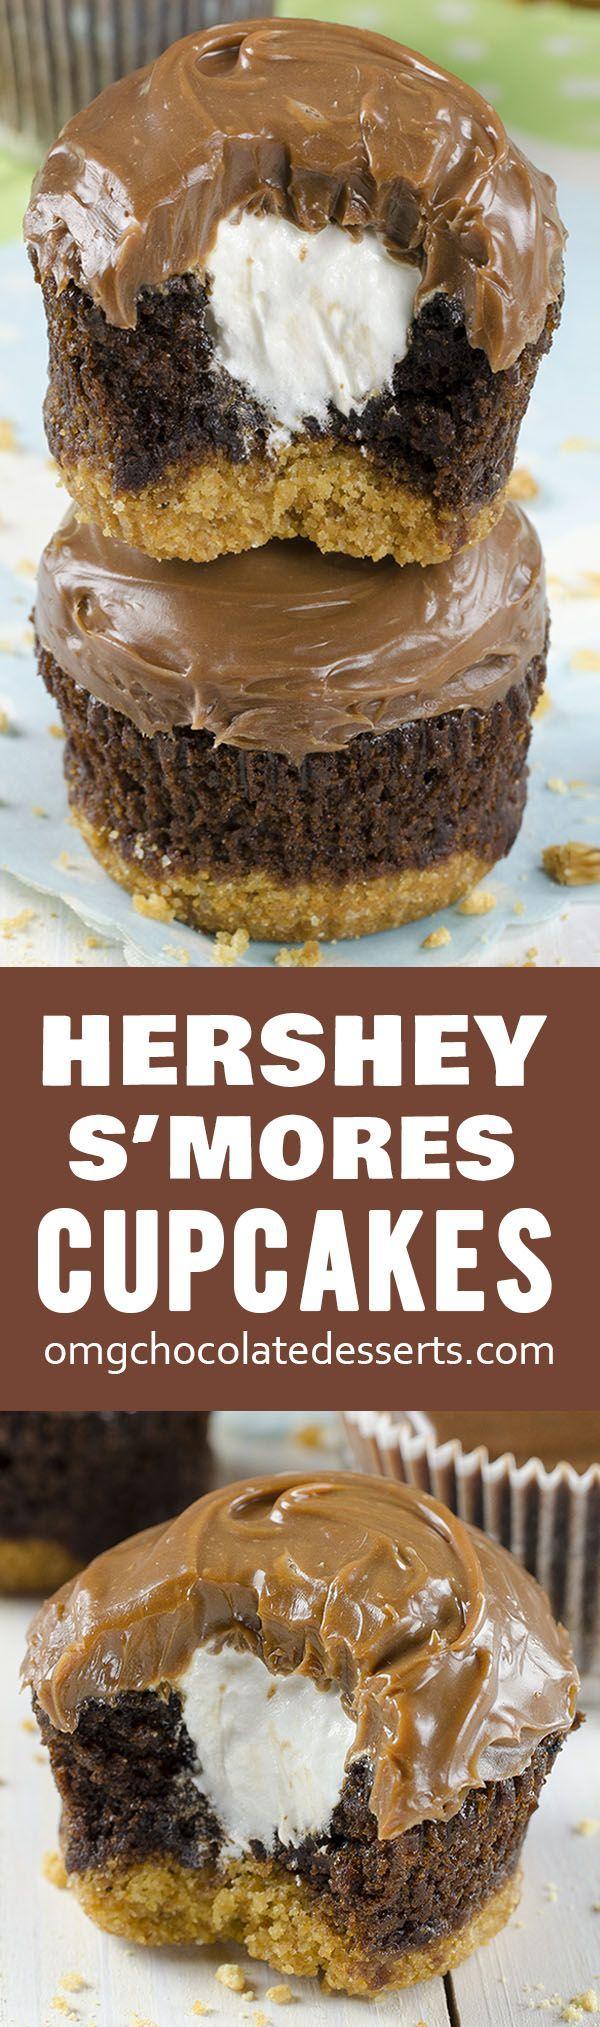 Hershey S'mores Cupcakes   Recipe   Graham cracker crust ...